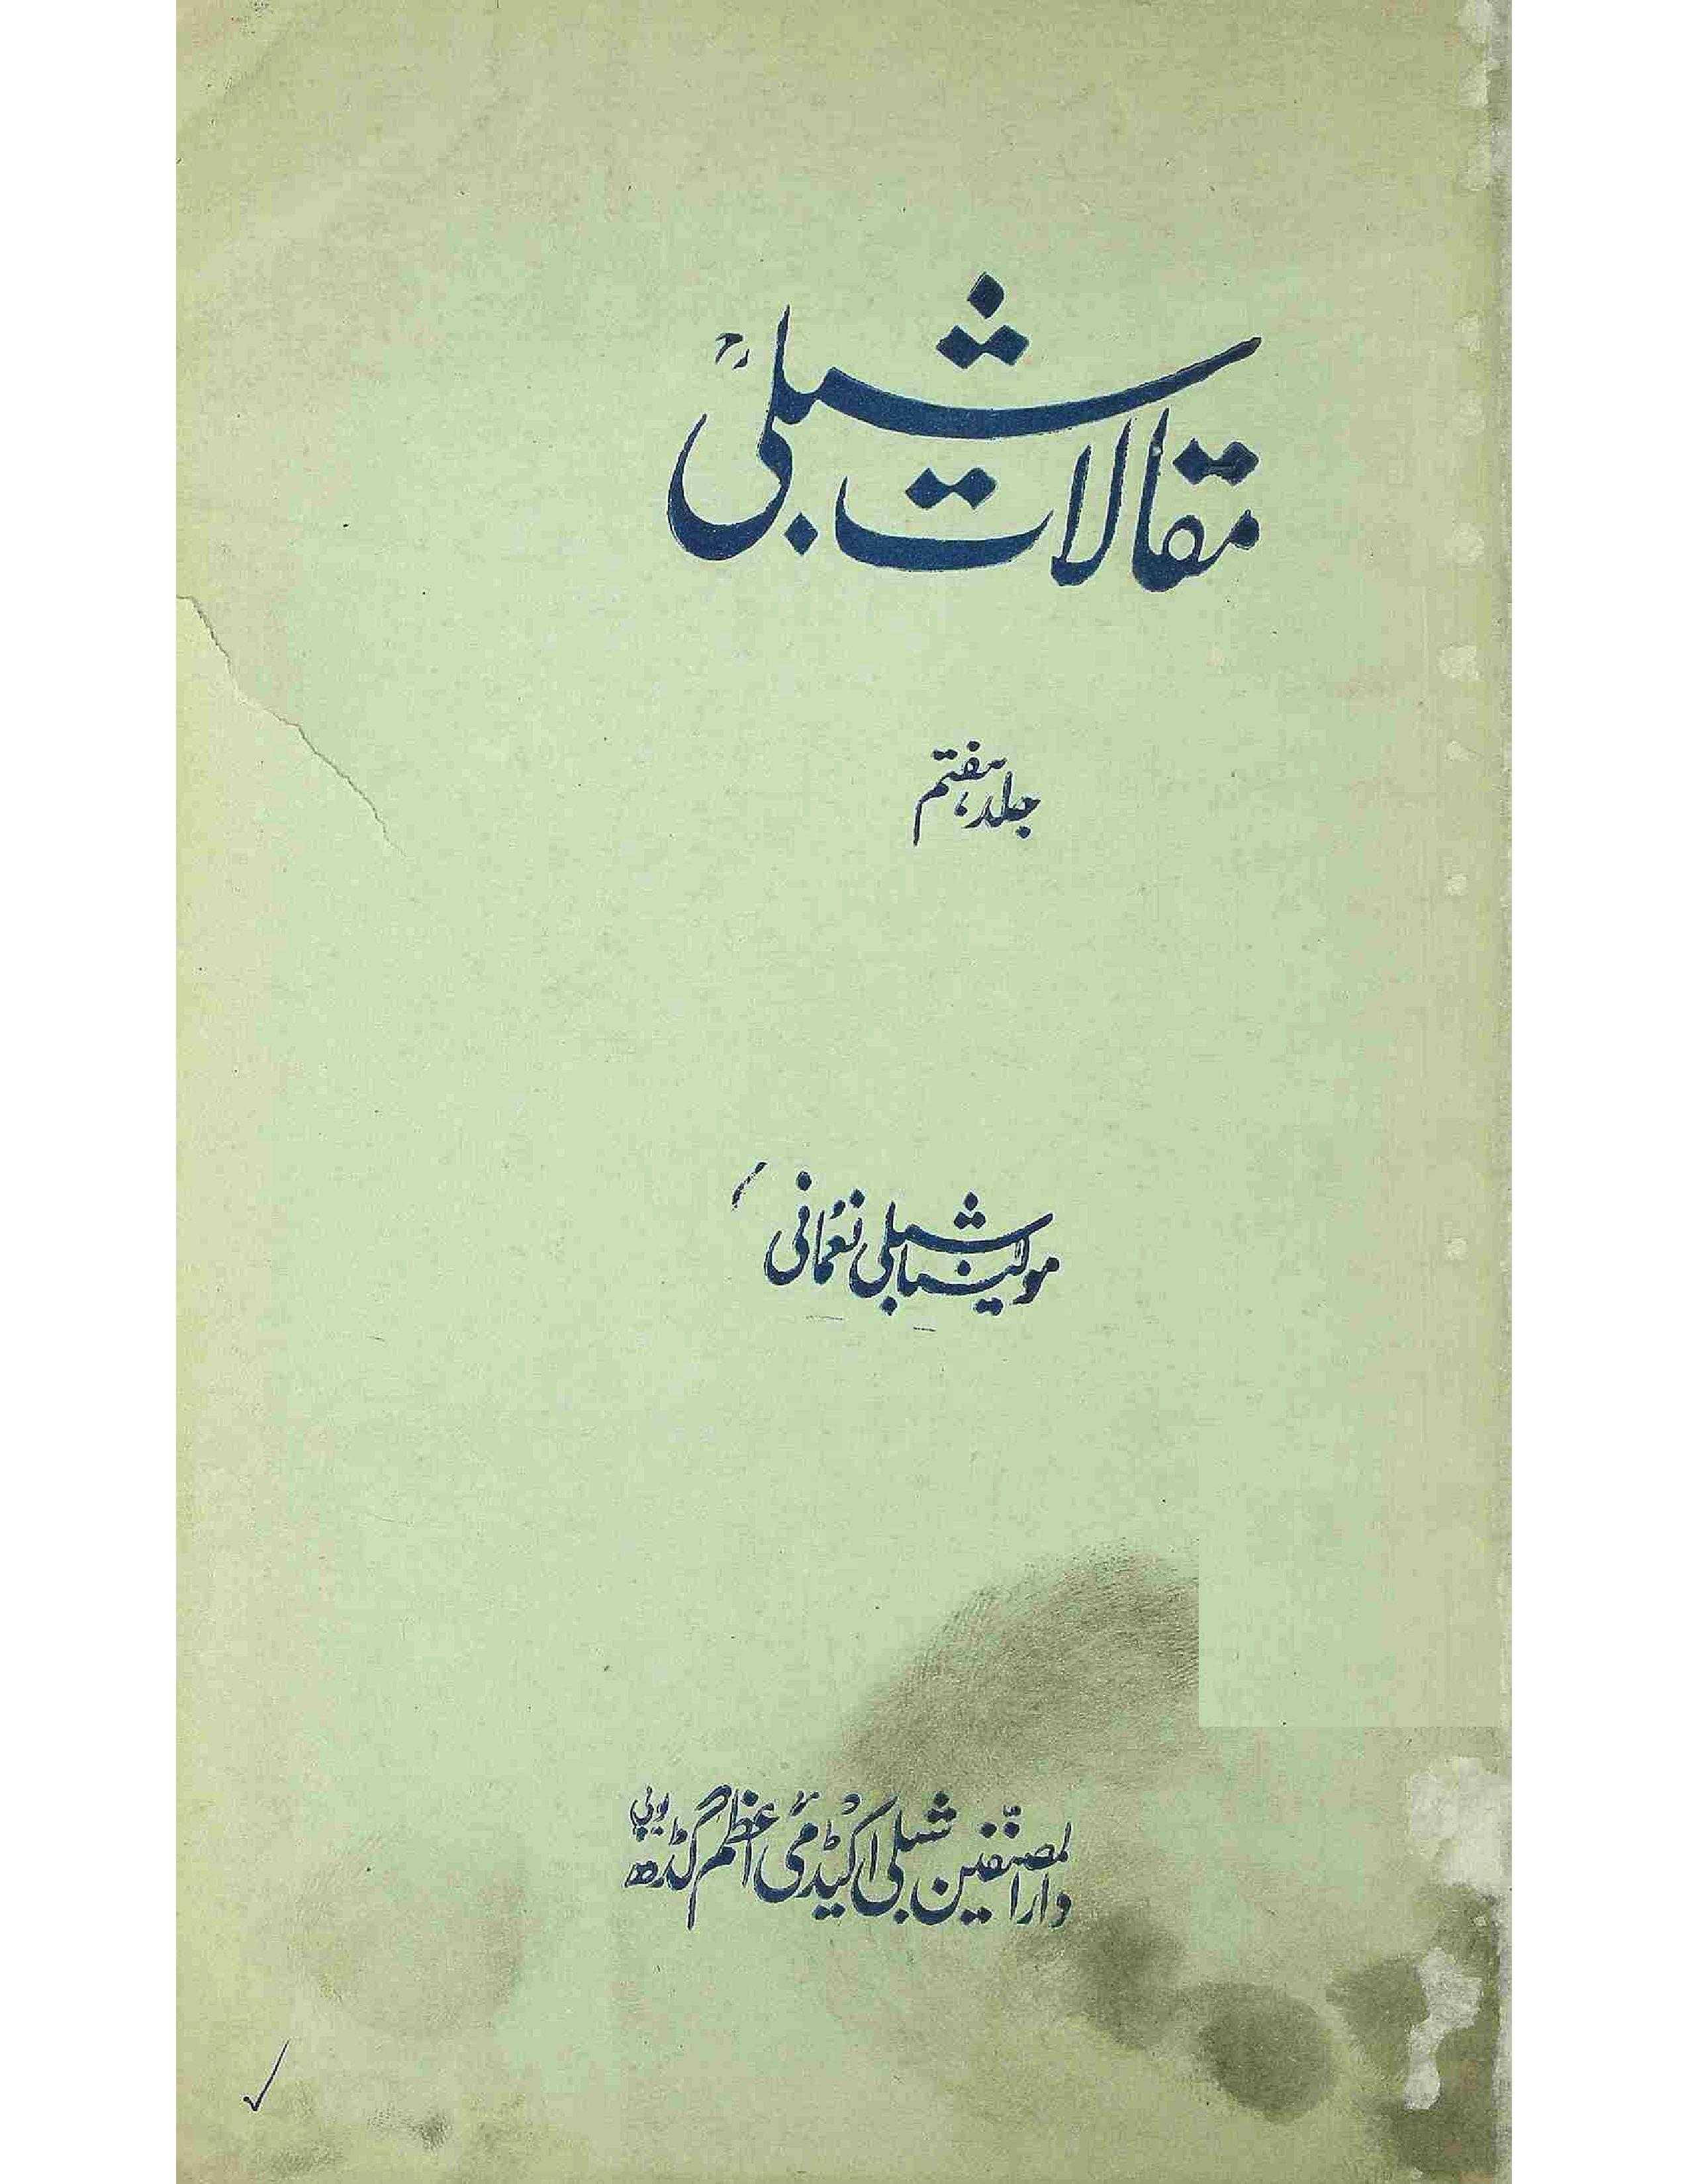 Maqalat-e-Shibli     Volume-007